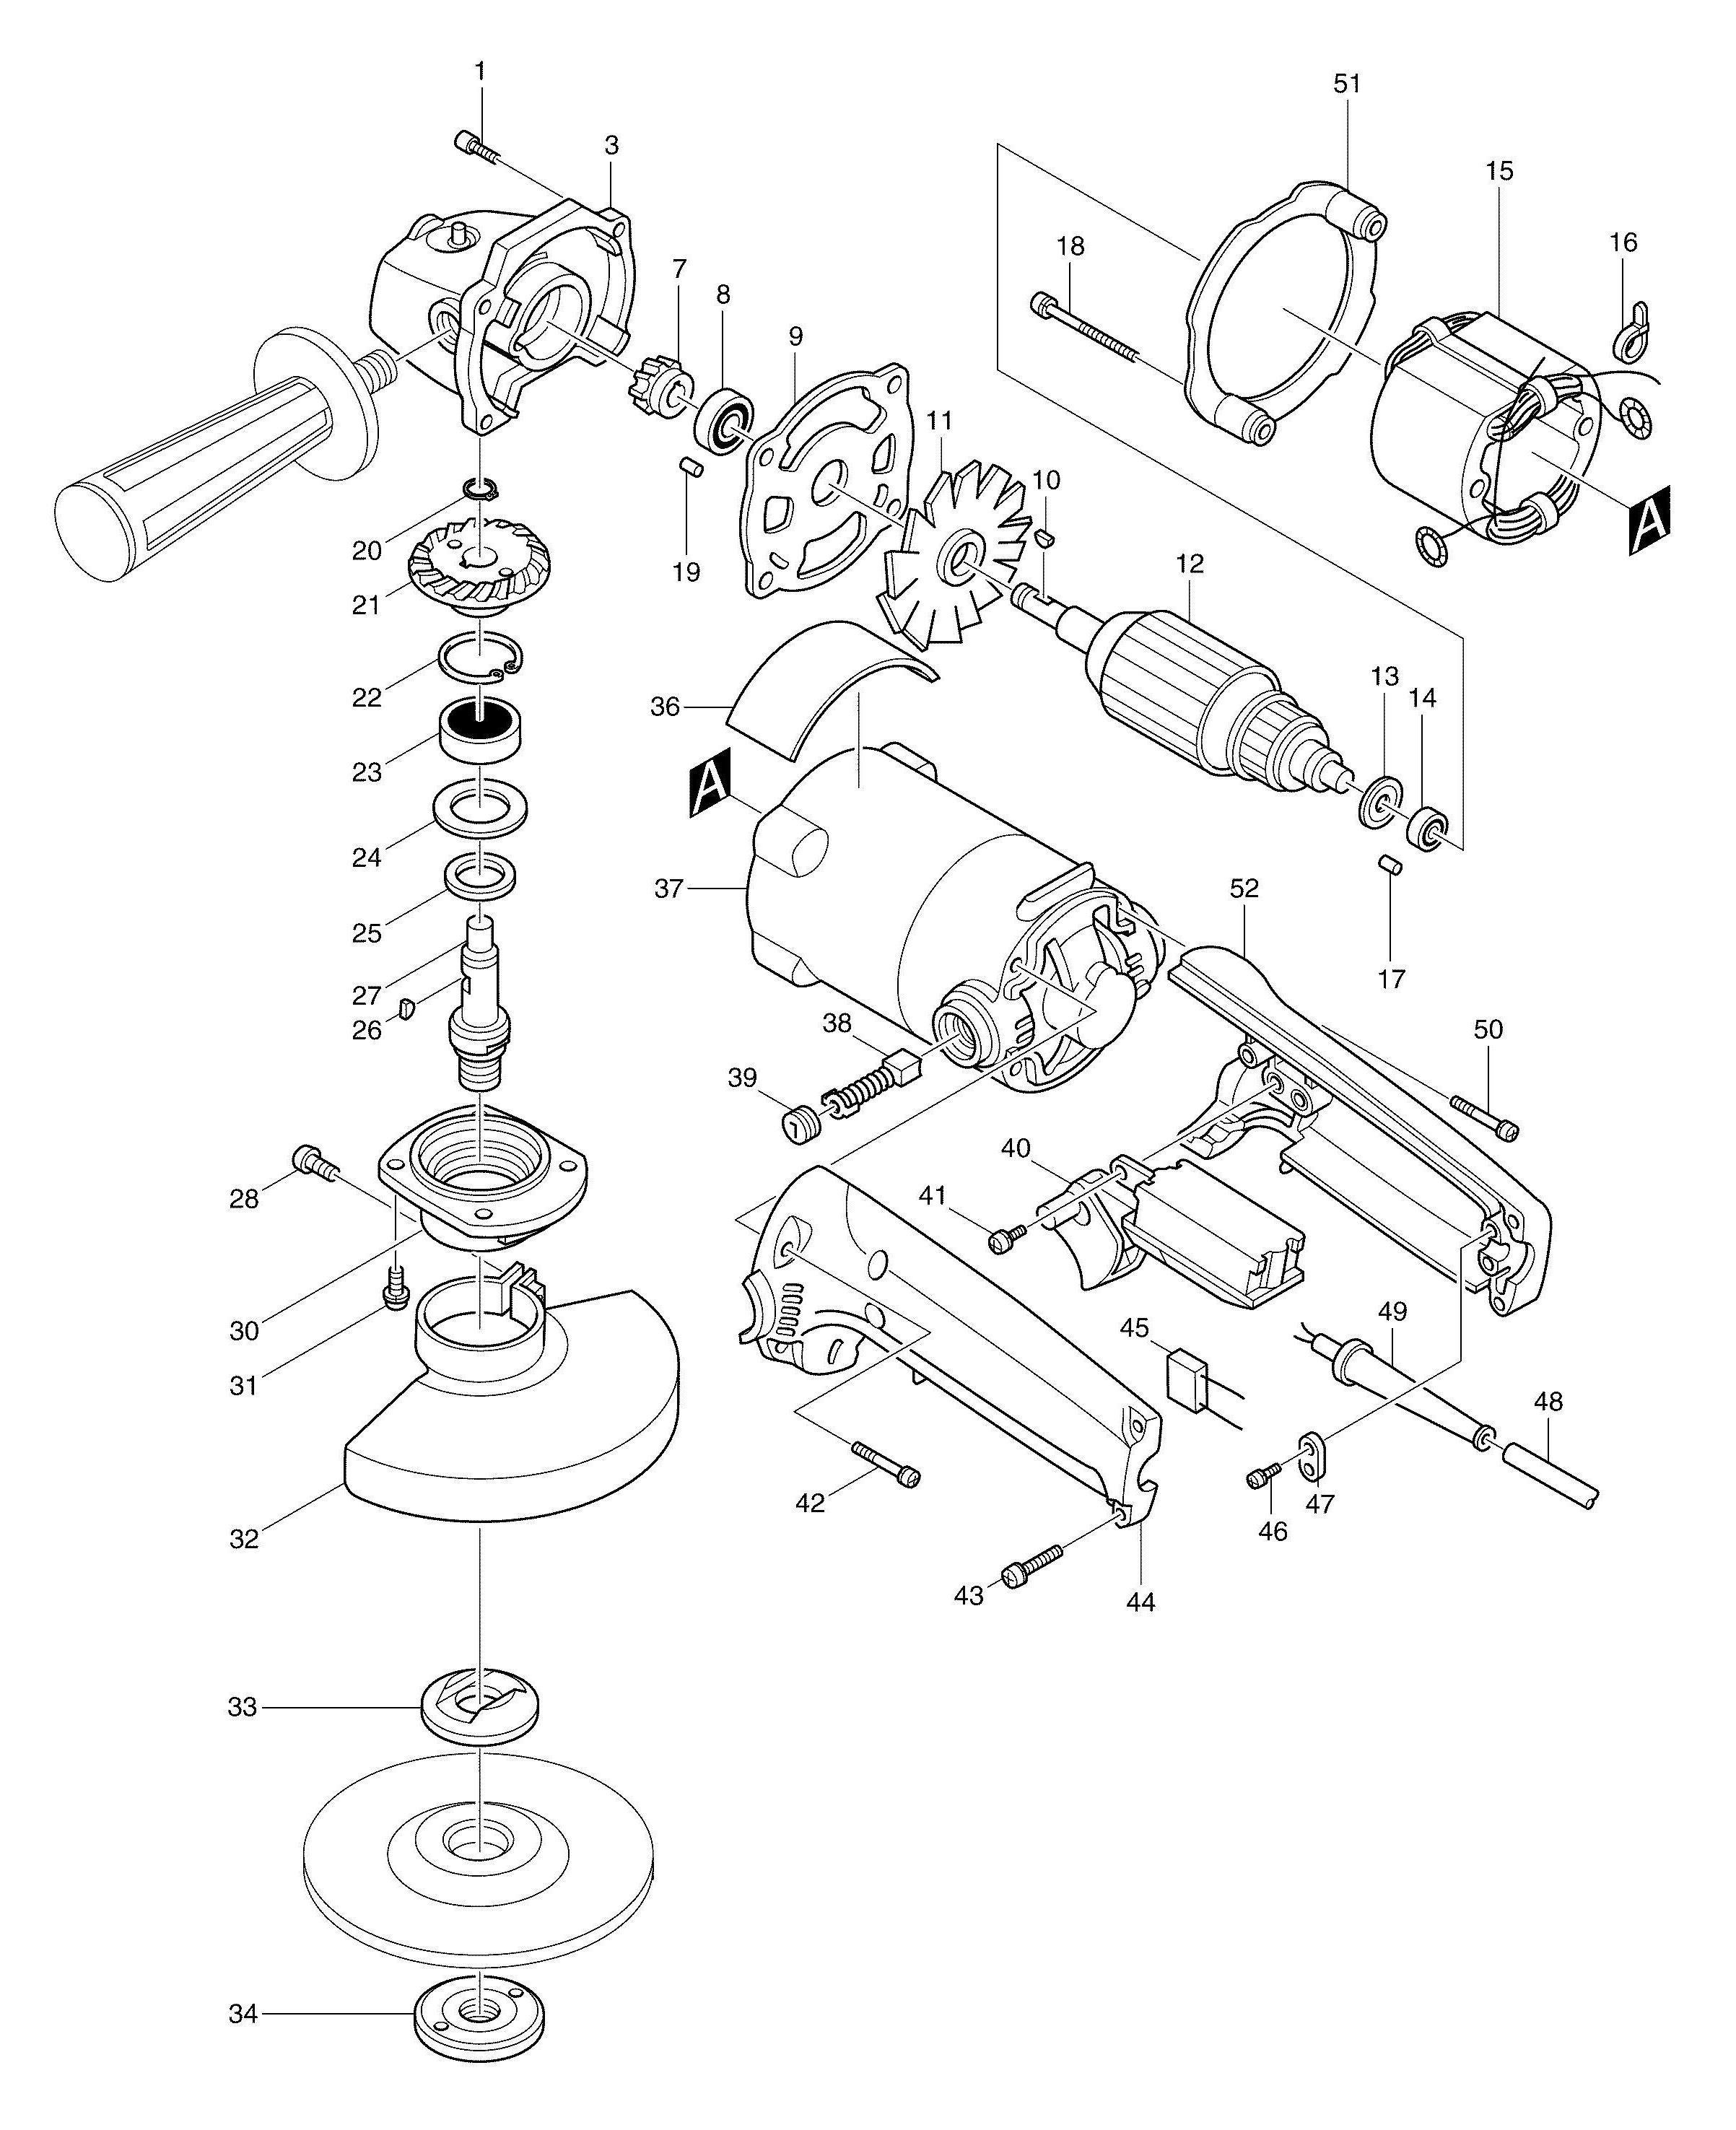 9005B_WW rv 50 amp 120 volt wiring diagram tractor repair with wiring diagram,Wiring Diagram For 30 Amp 240 Volt Plug